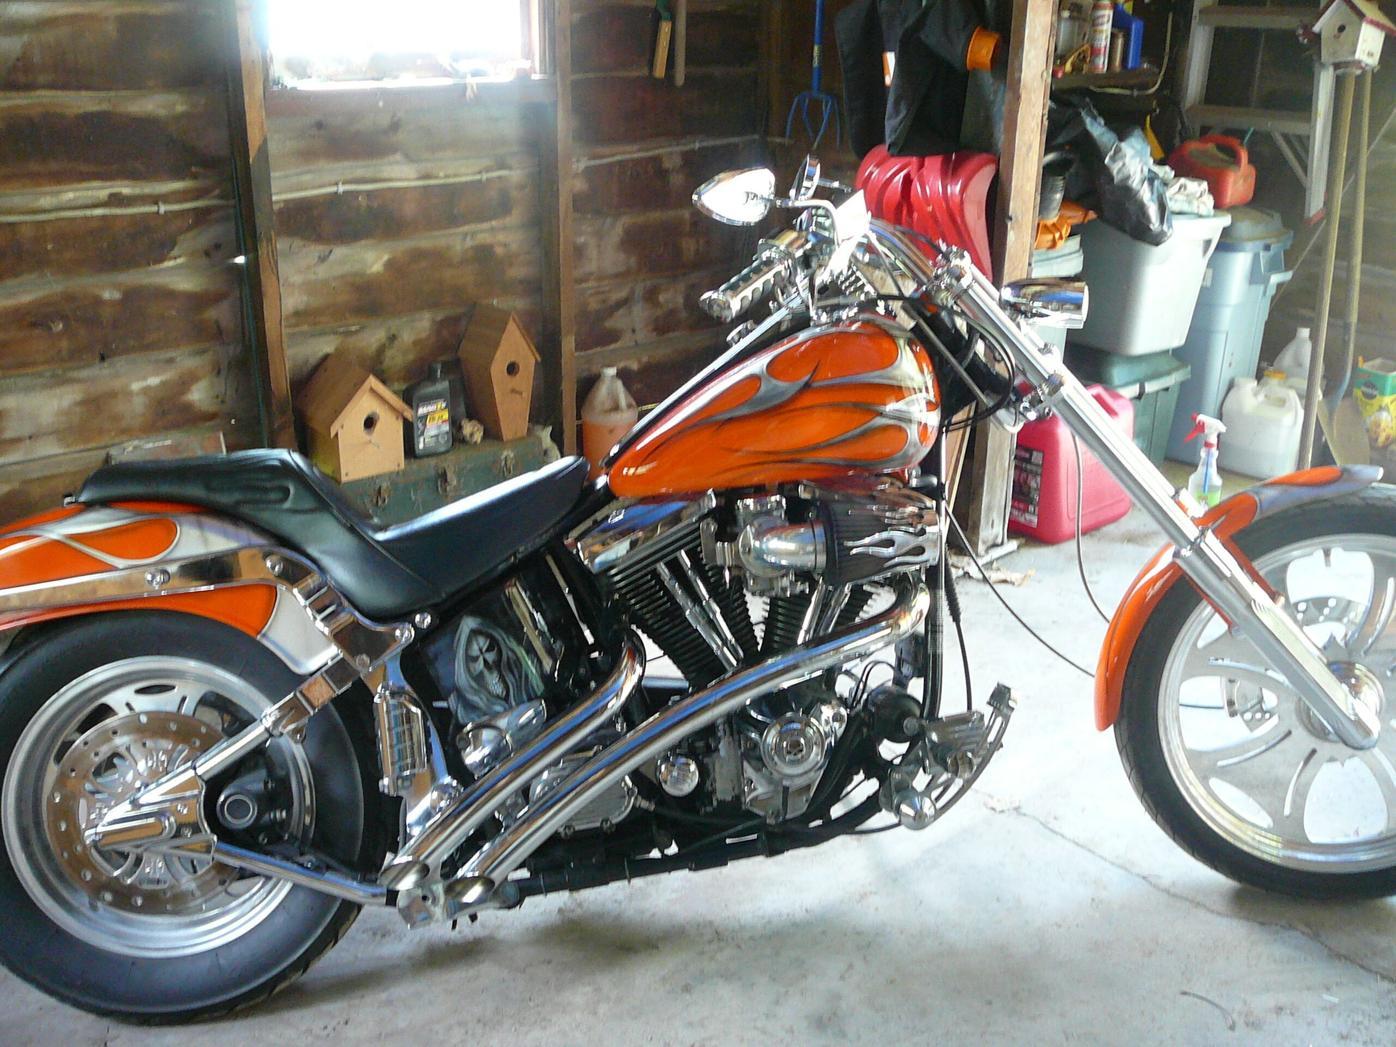 1989 Custom Harley image 1